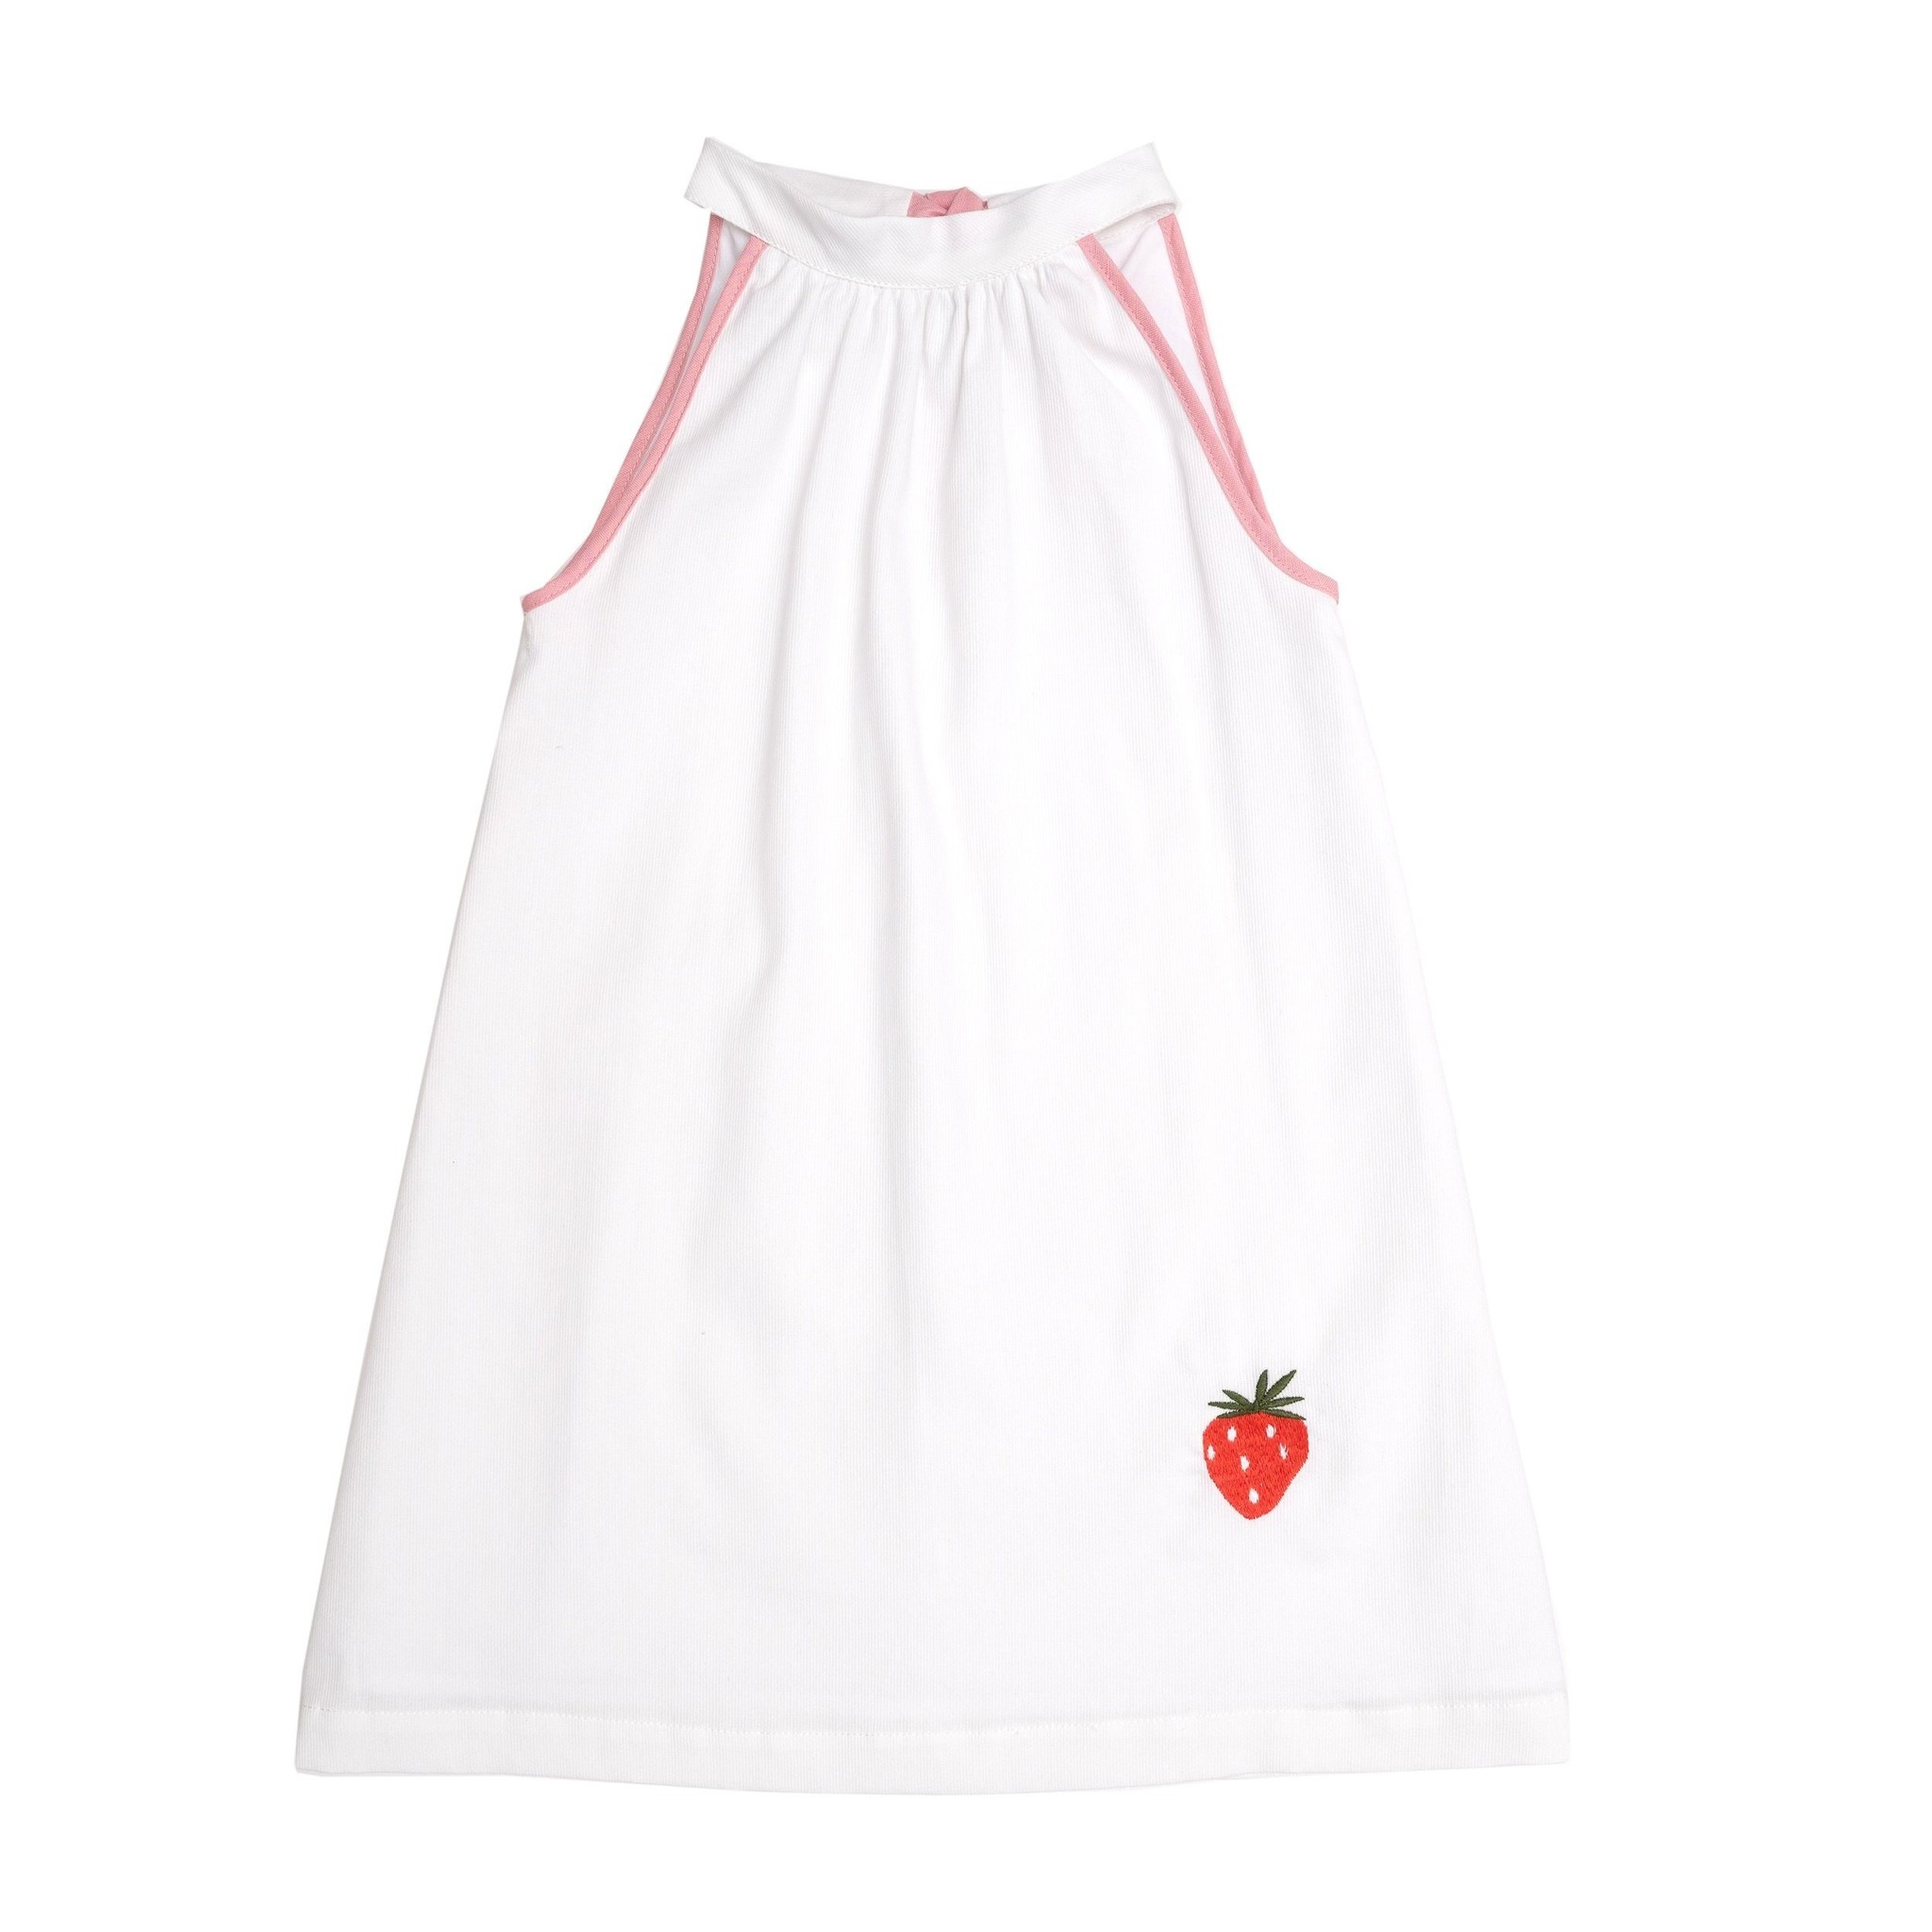 The Oaks Apparel Jewel Strawberry Dress